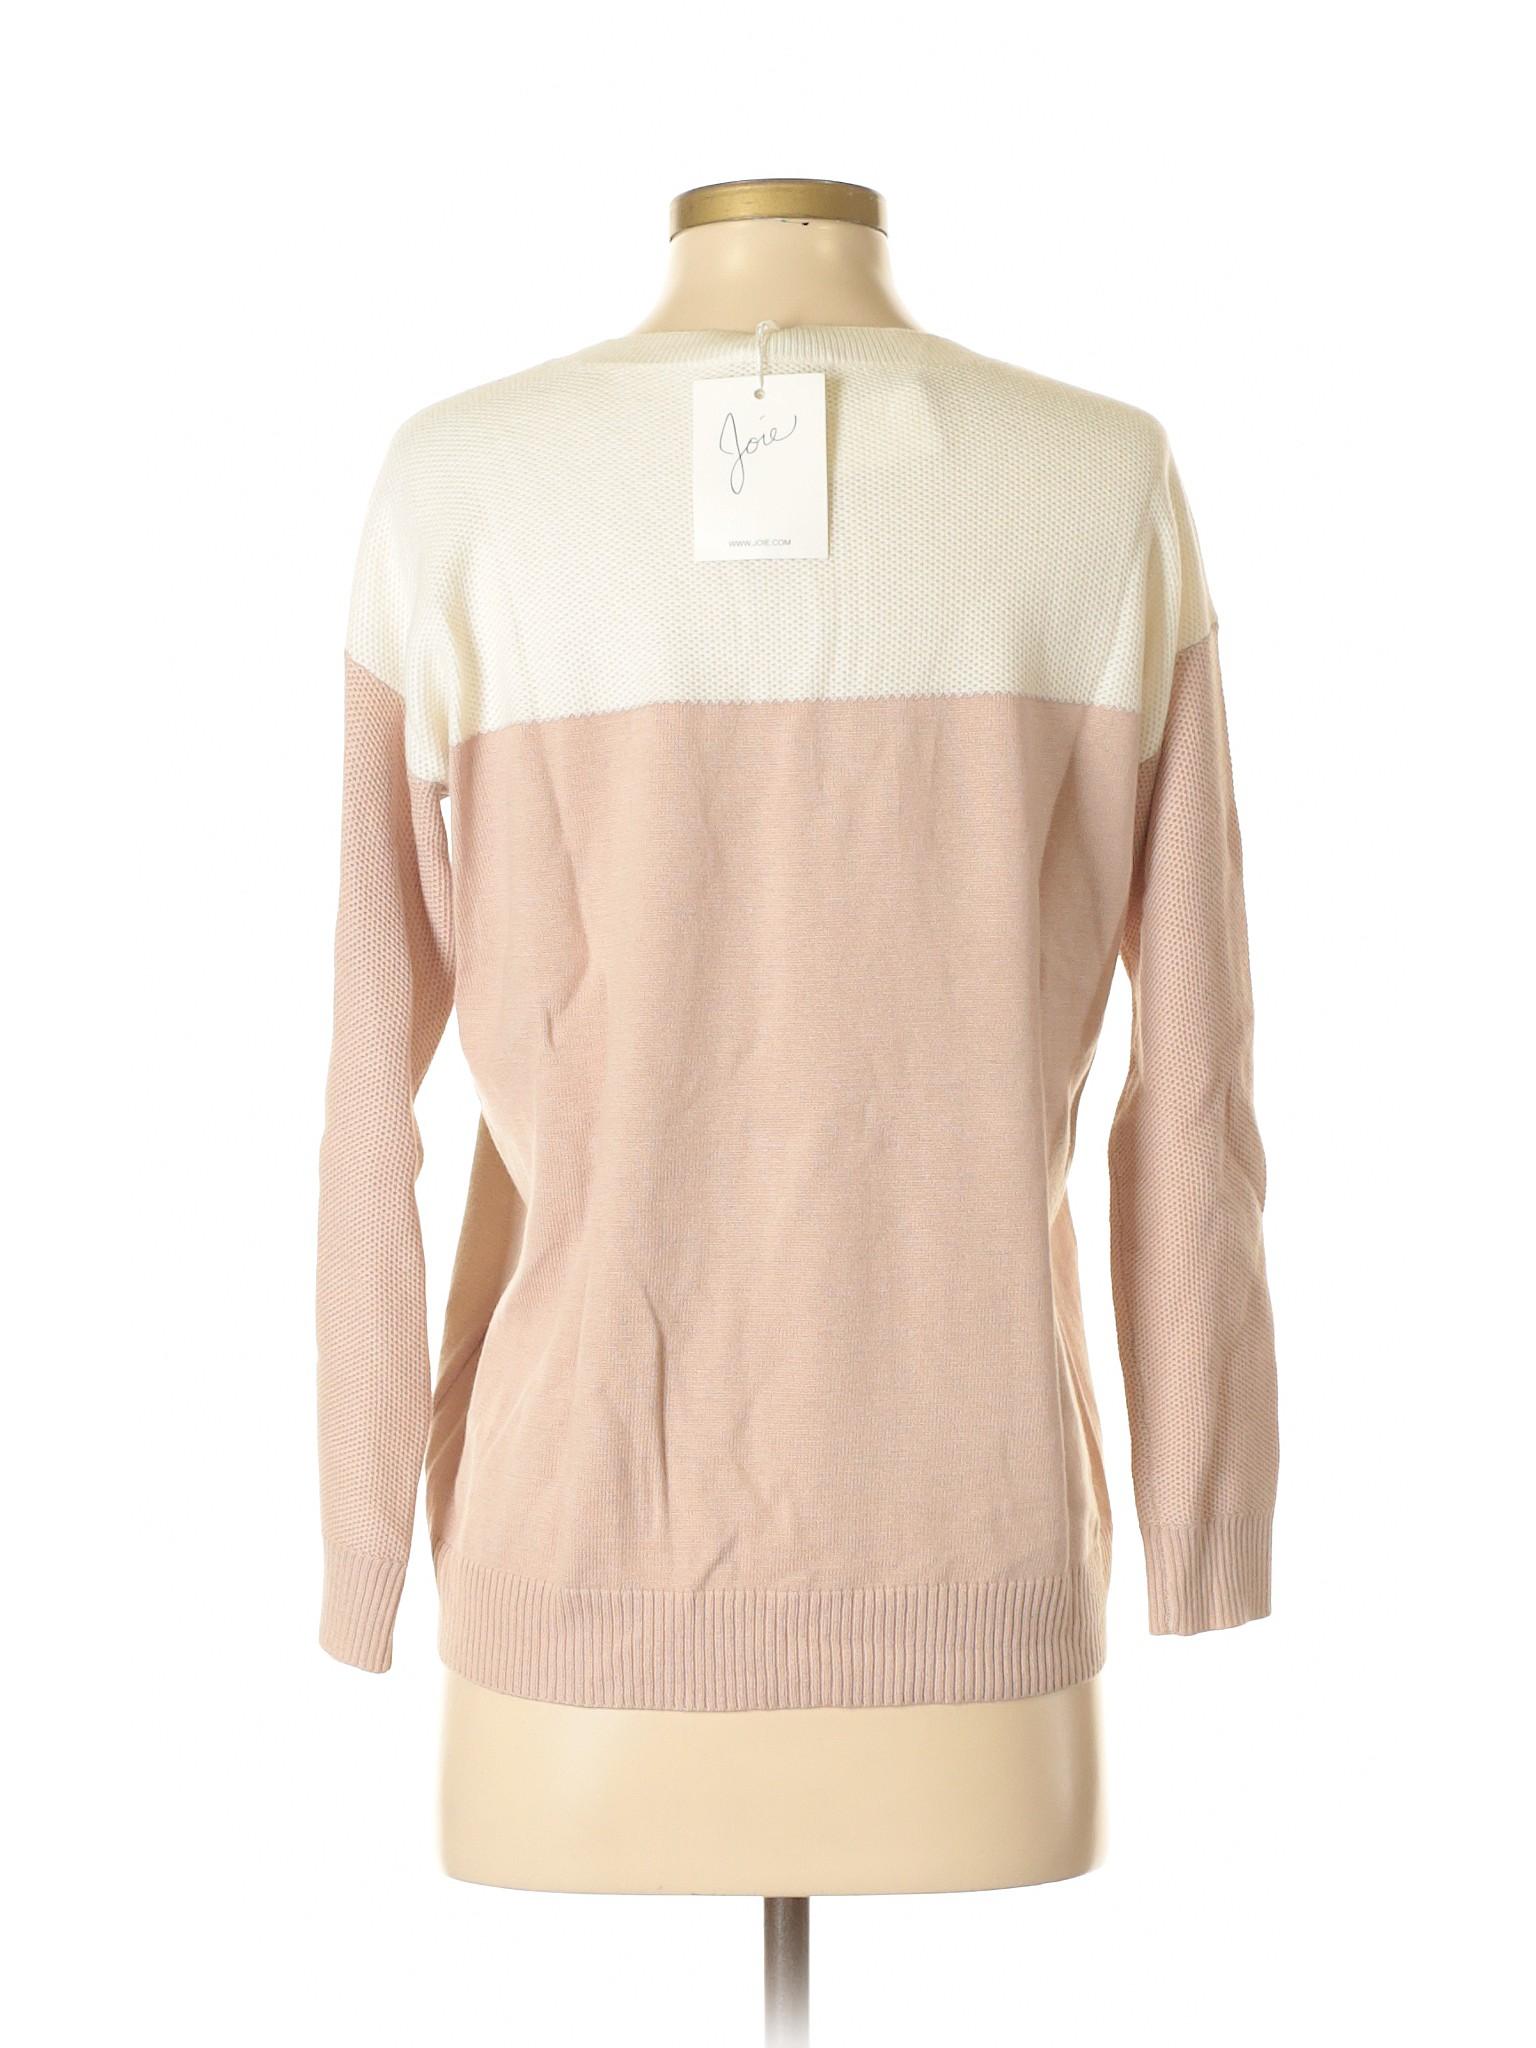 Pullover Boutique Sweater Joie Boutique Joie q0wWOgF